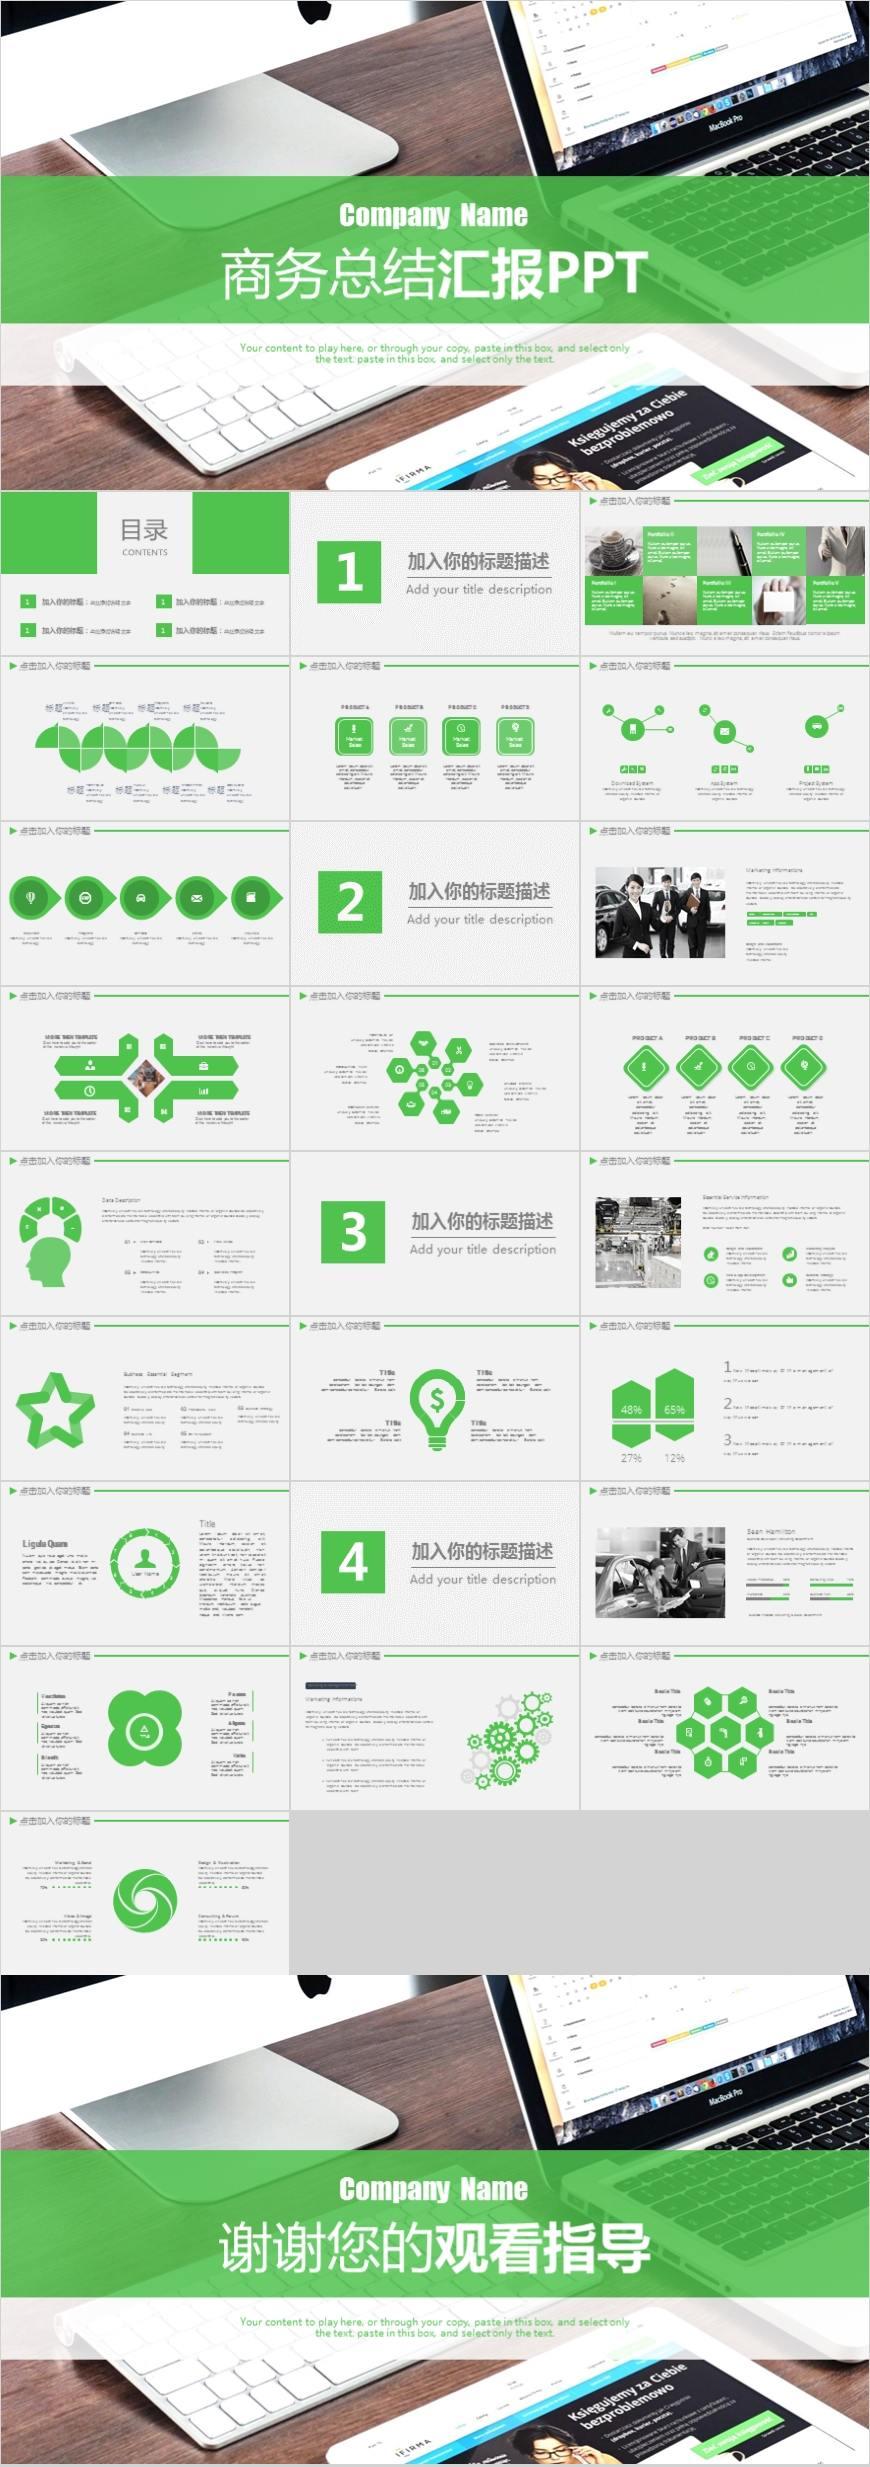 GZ0025 绿色商务总结汇报商务通用PPT模板